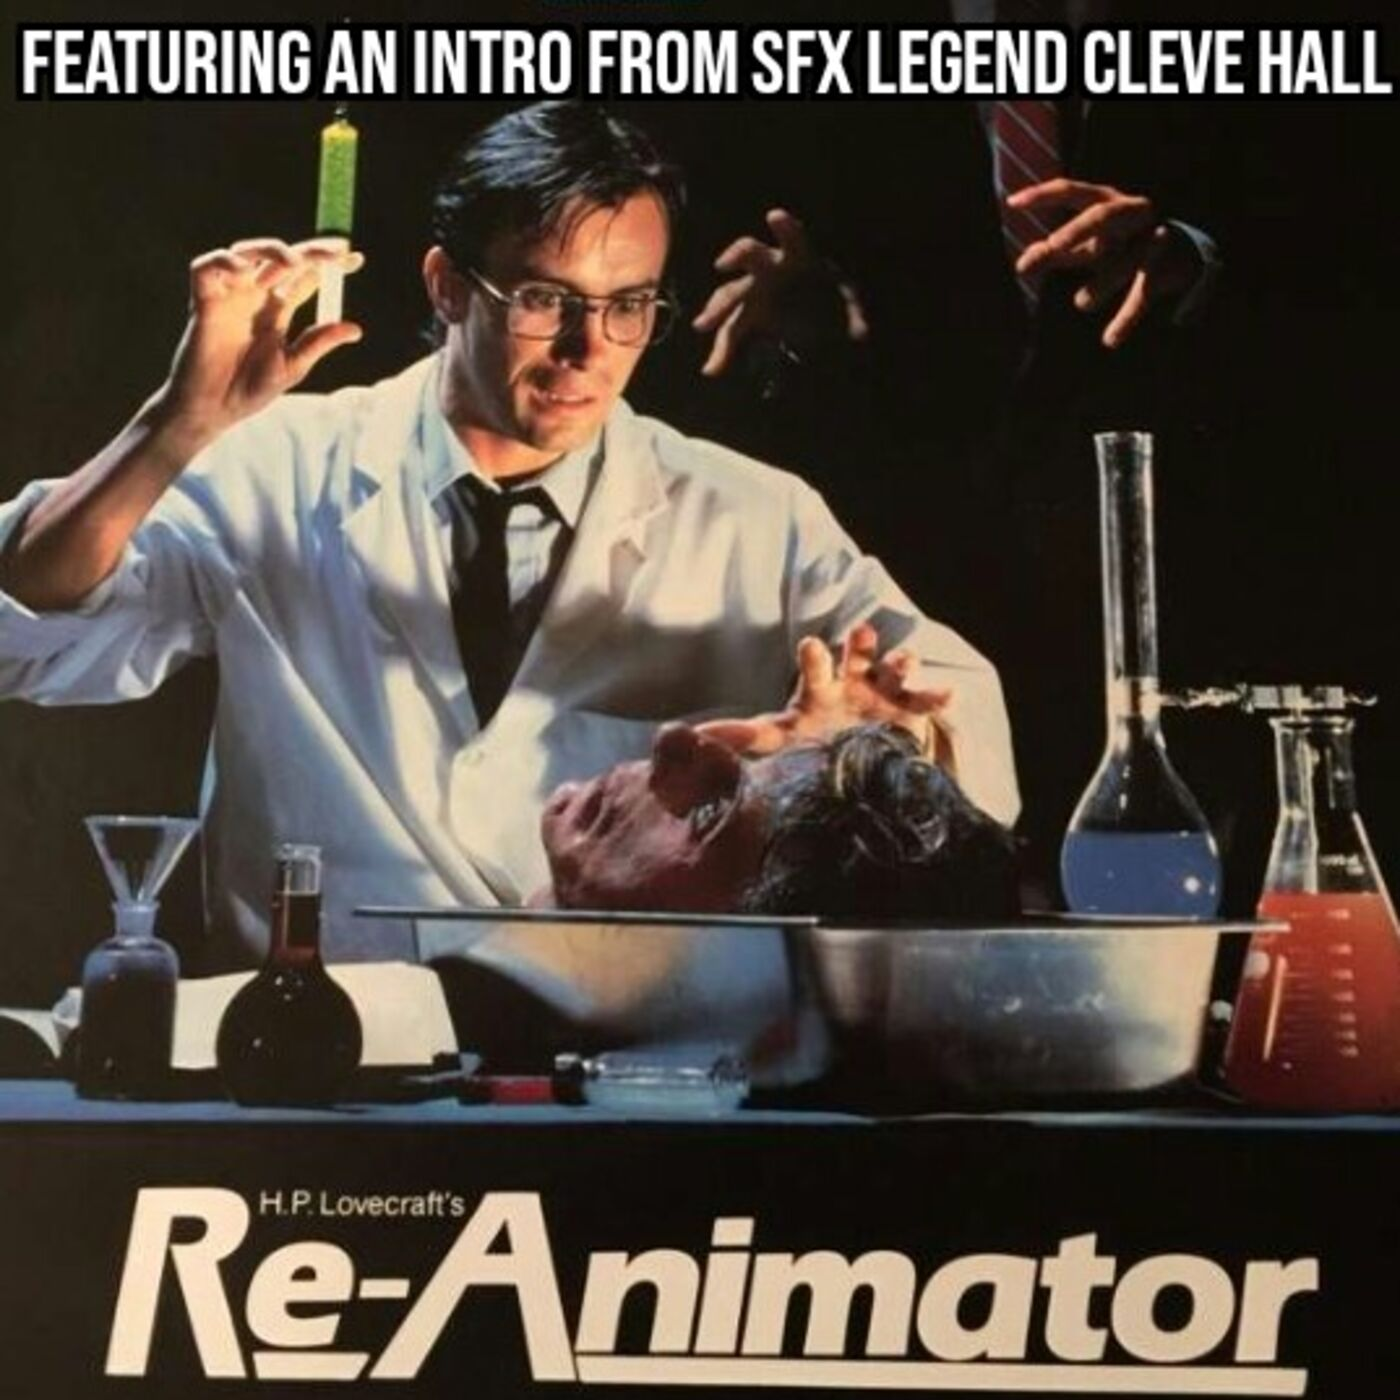 Re-Animator (1985)